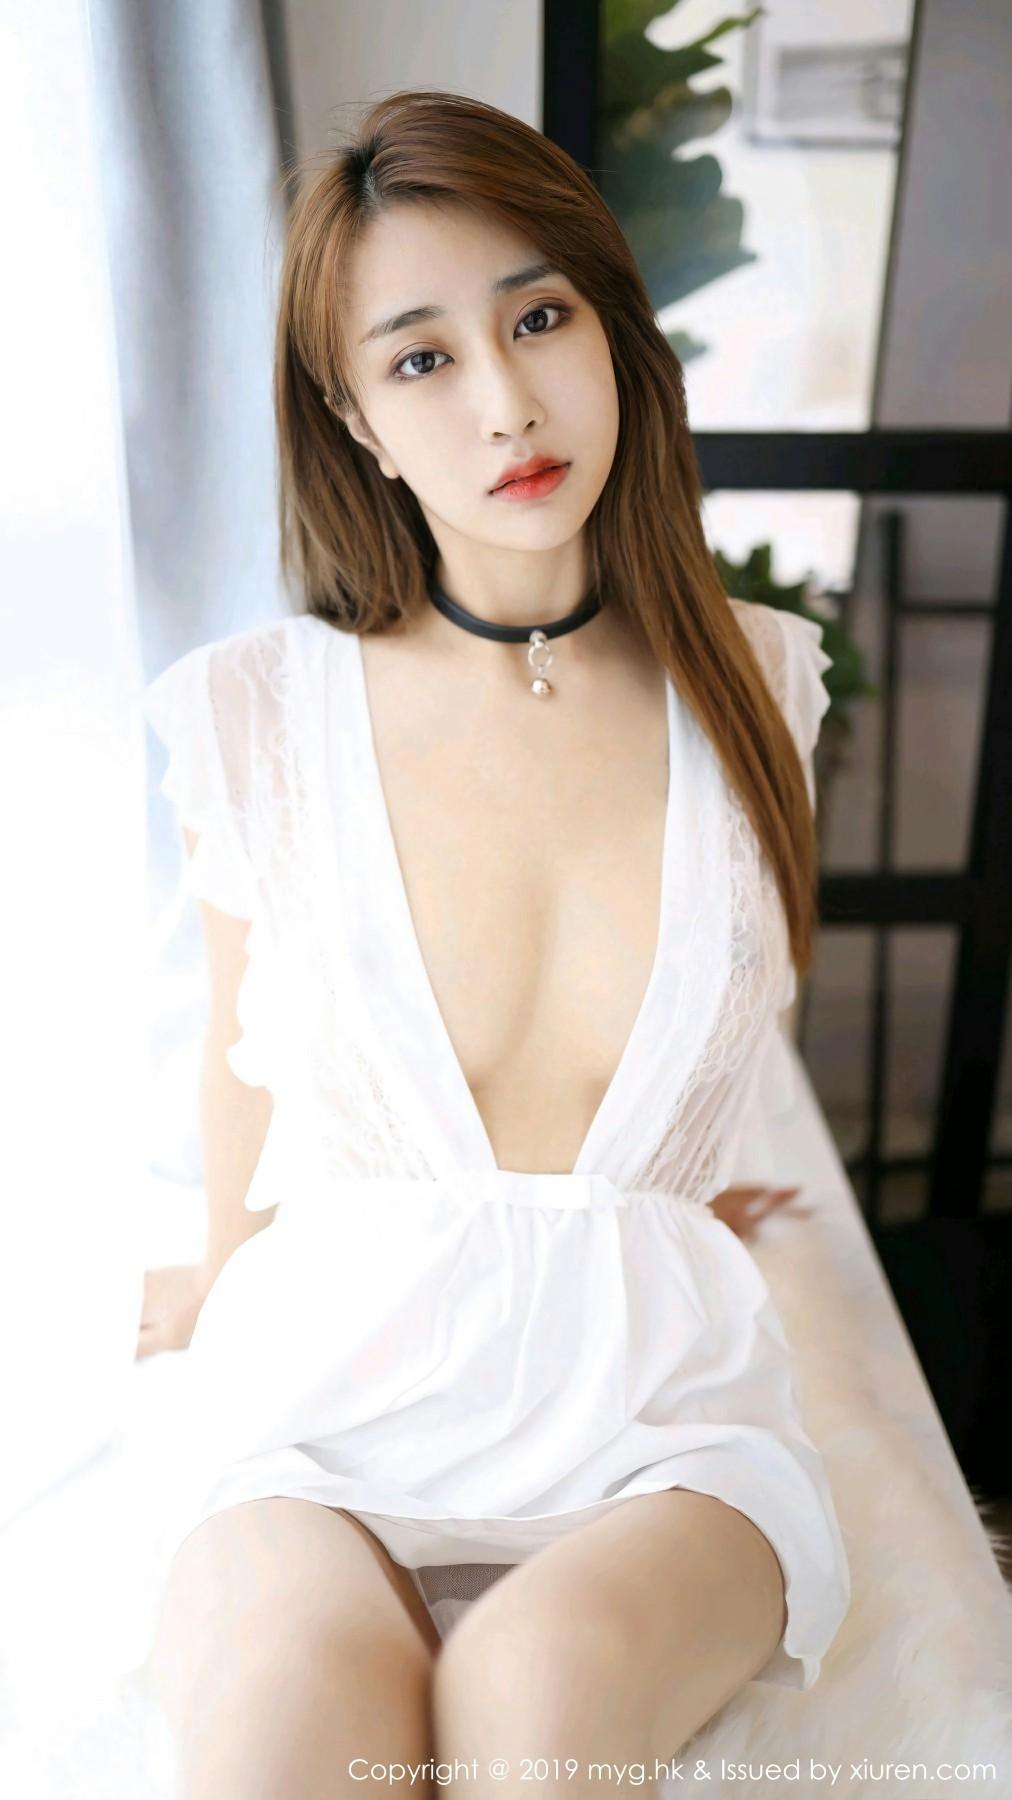 [MyGirl美媛馆]2019.07.15 VOL.369 奈美nana